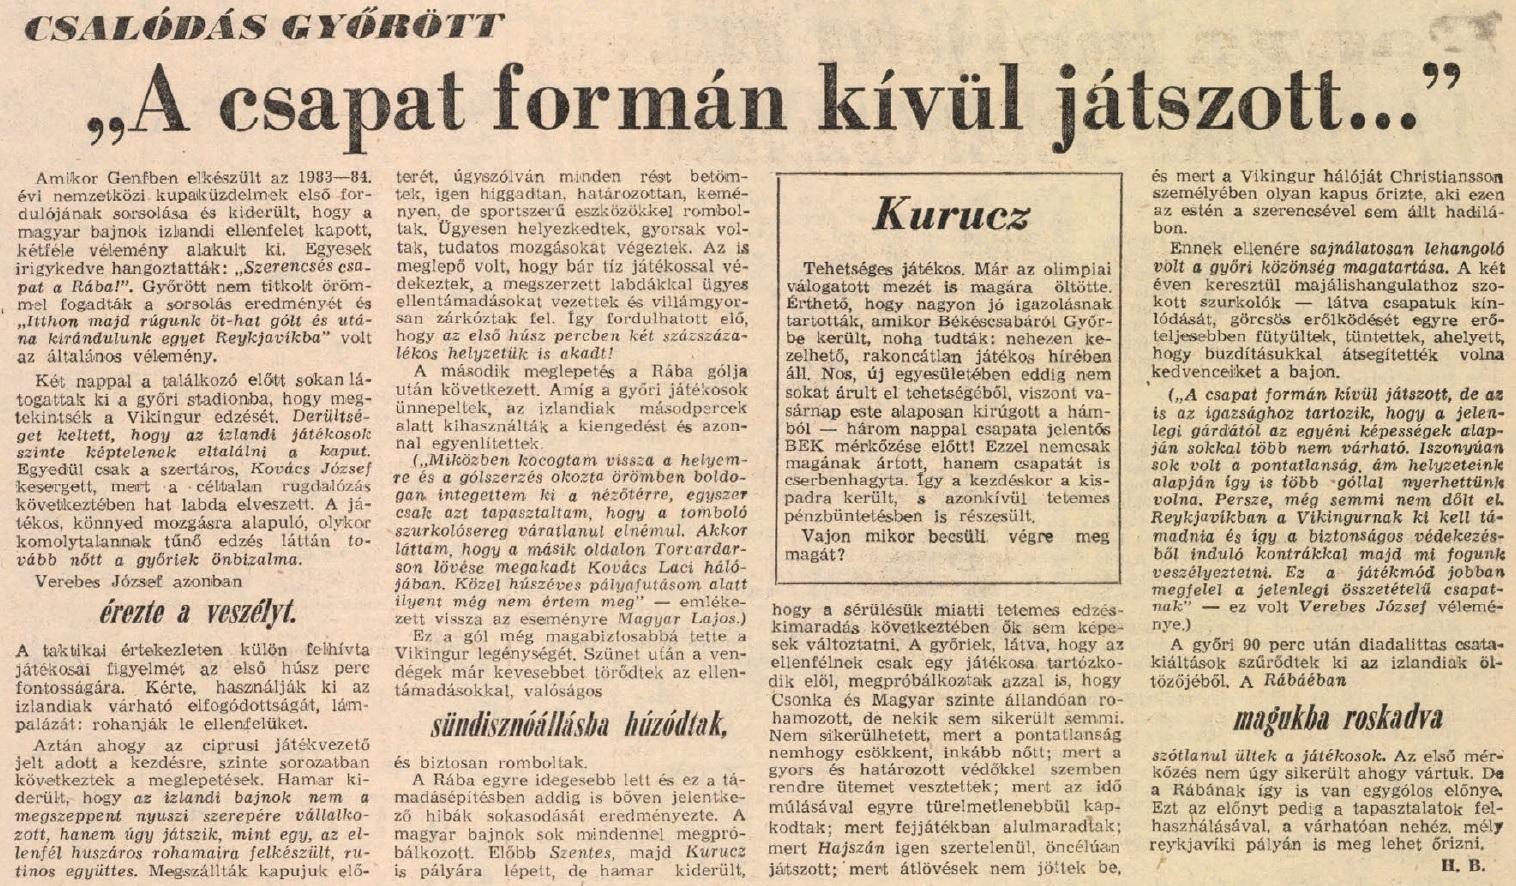 idokapszula_nb_i_1983_84_klubcsapataink_nemzetkozi_kupaszereplese_1_fordulo_1_kor_raba_vikingur_2.jpg